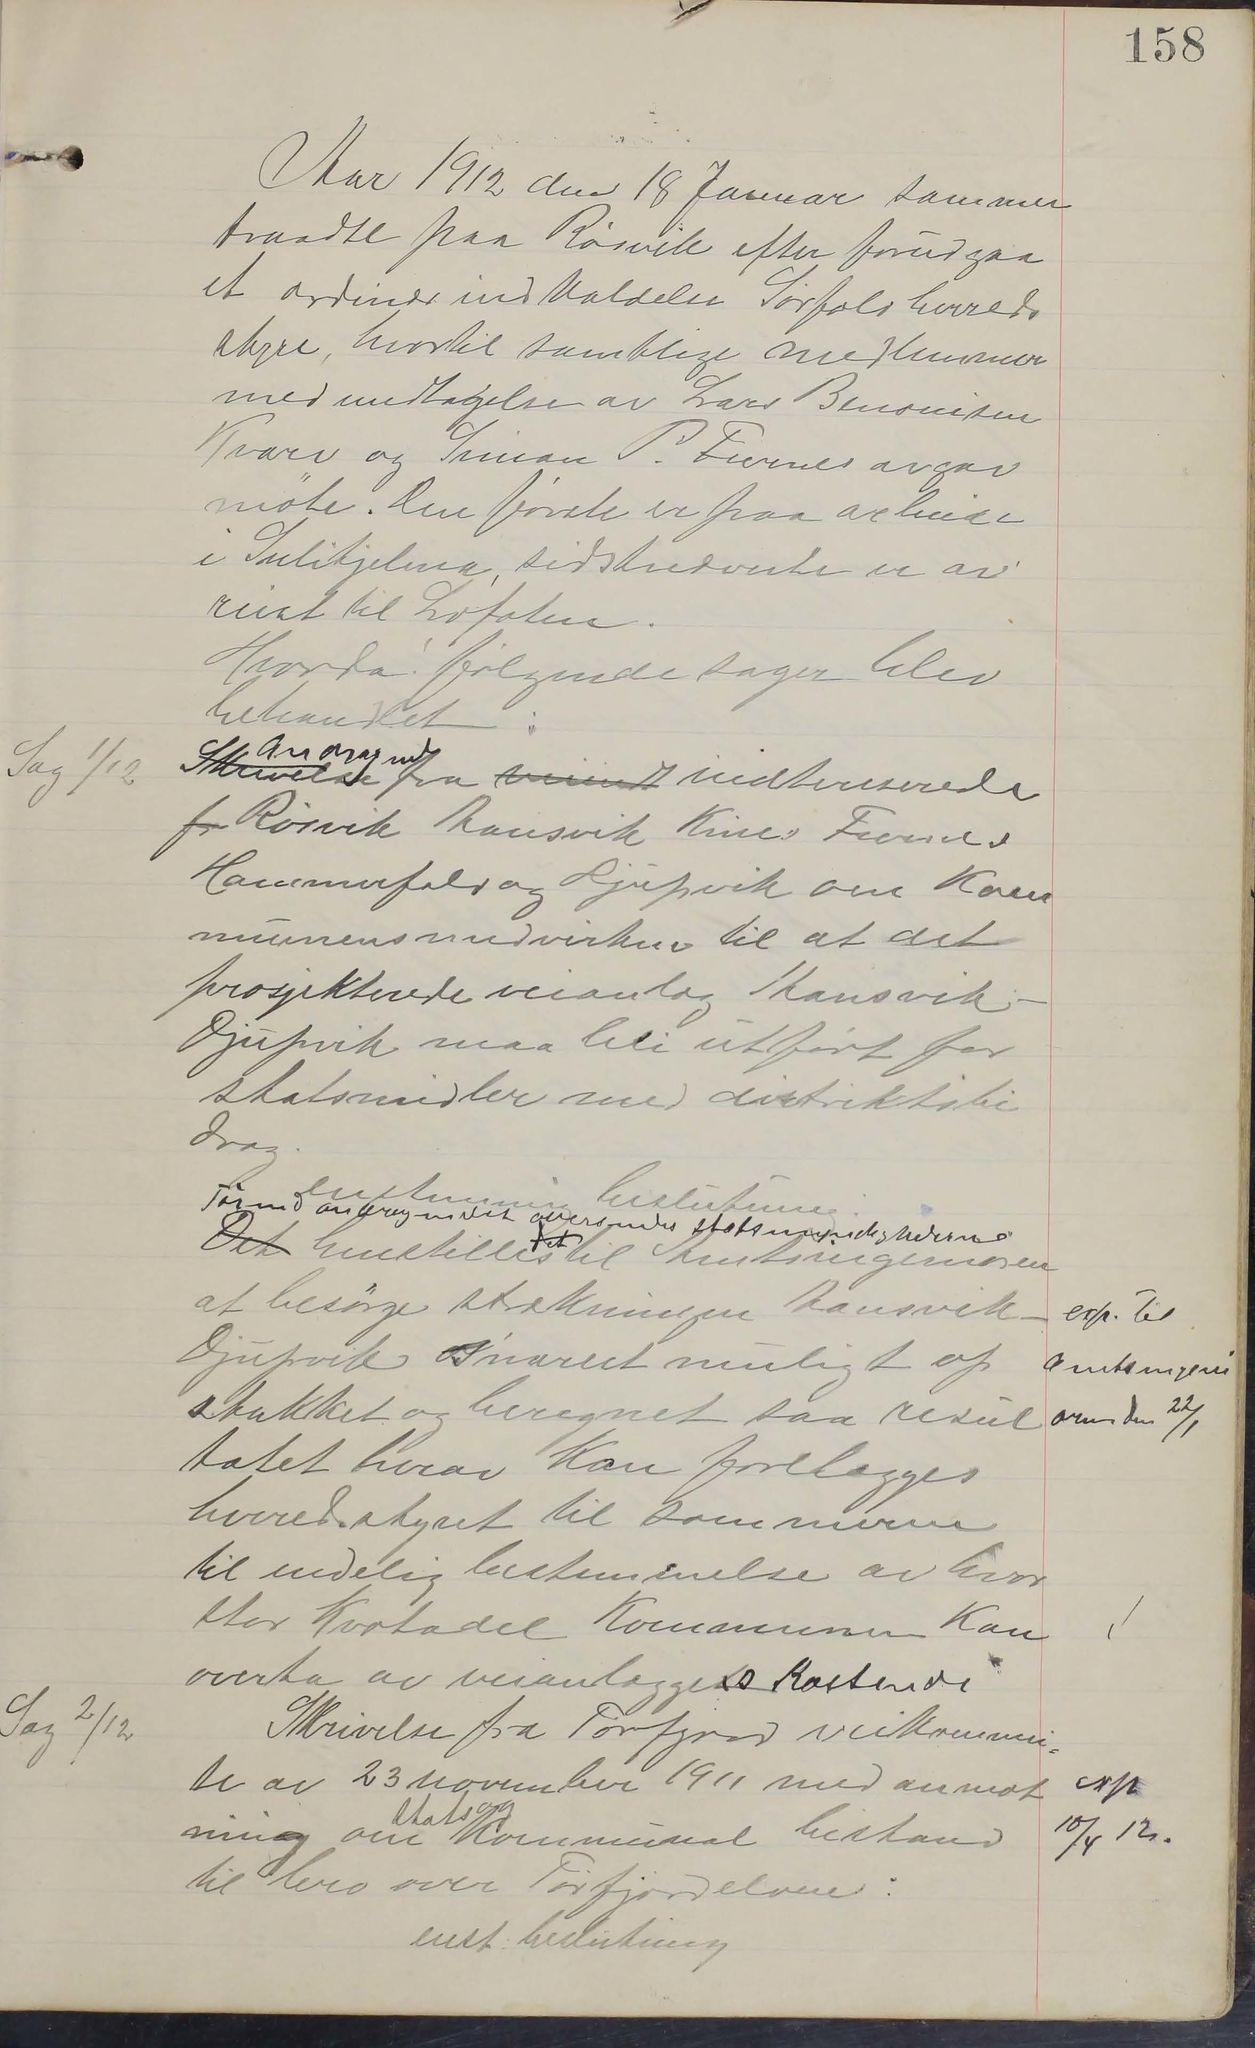 AIN, Sørfold kommune. Formannskap, 100/L0002: Forhandlingsprotokol for Sørfoldens formandskab, 1902-1913, s. 158